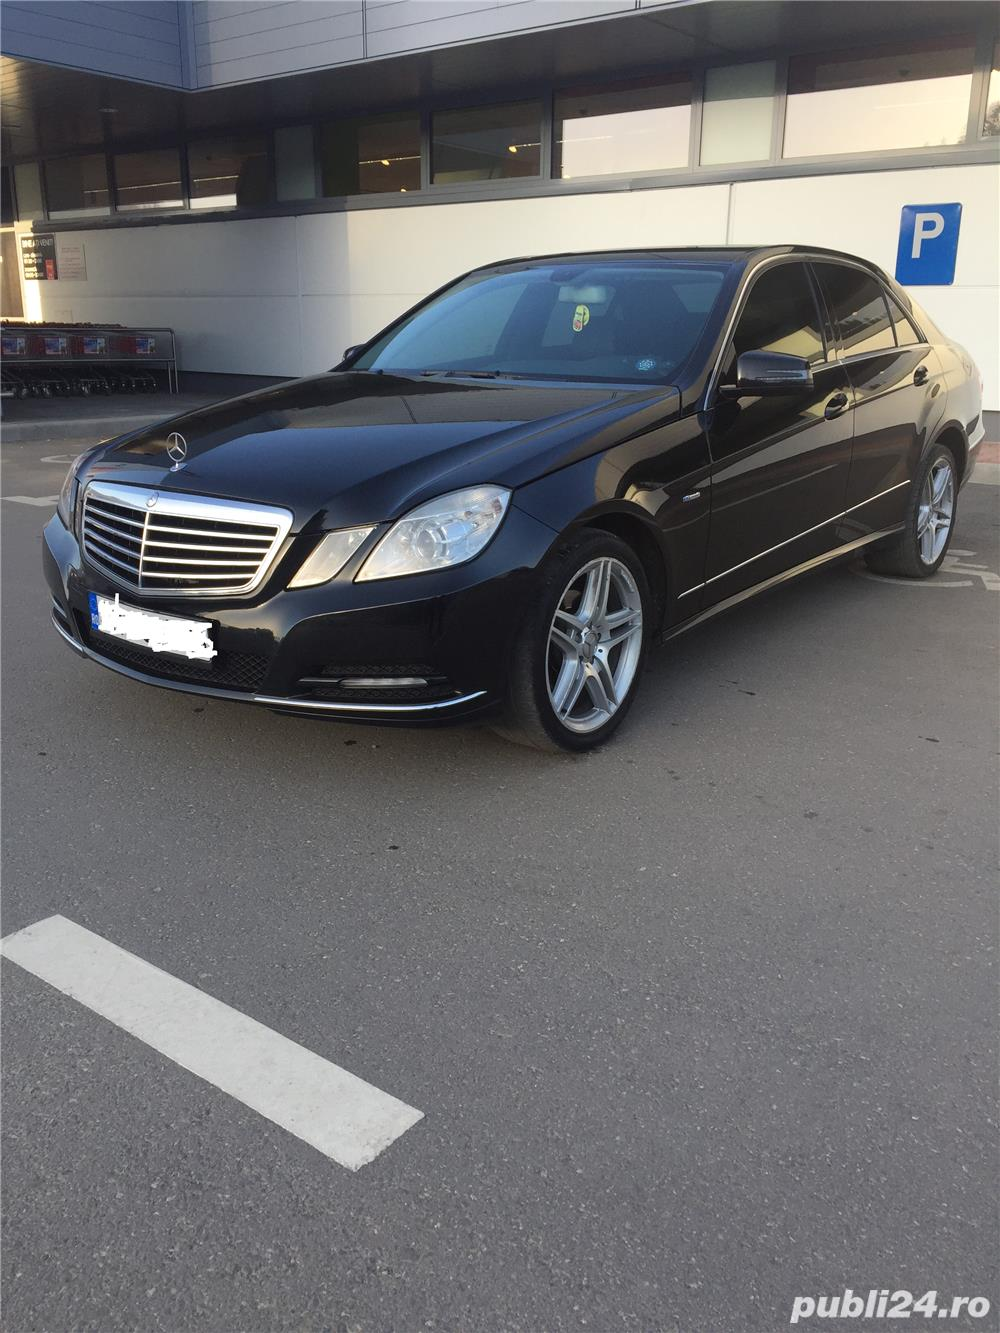 Mercedes-benz CE 220